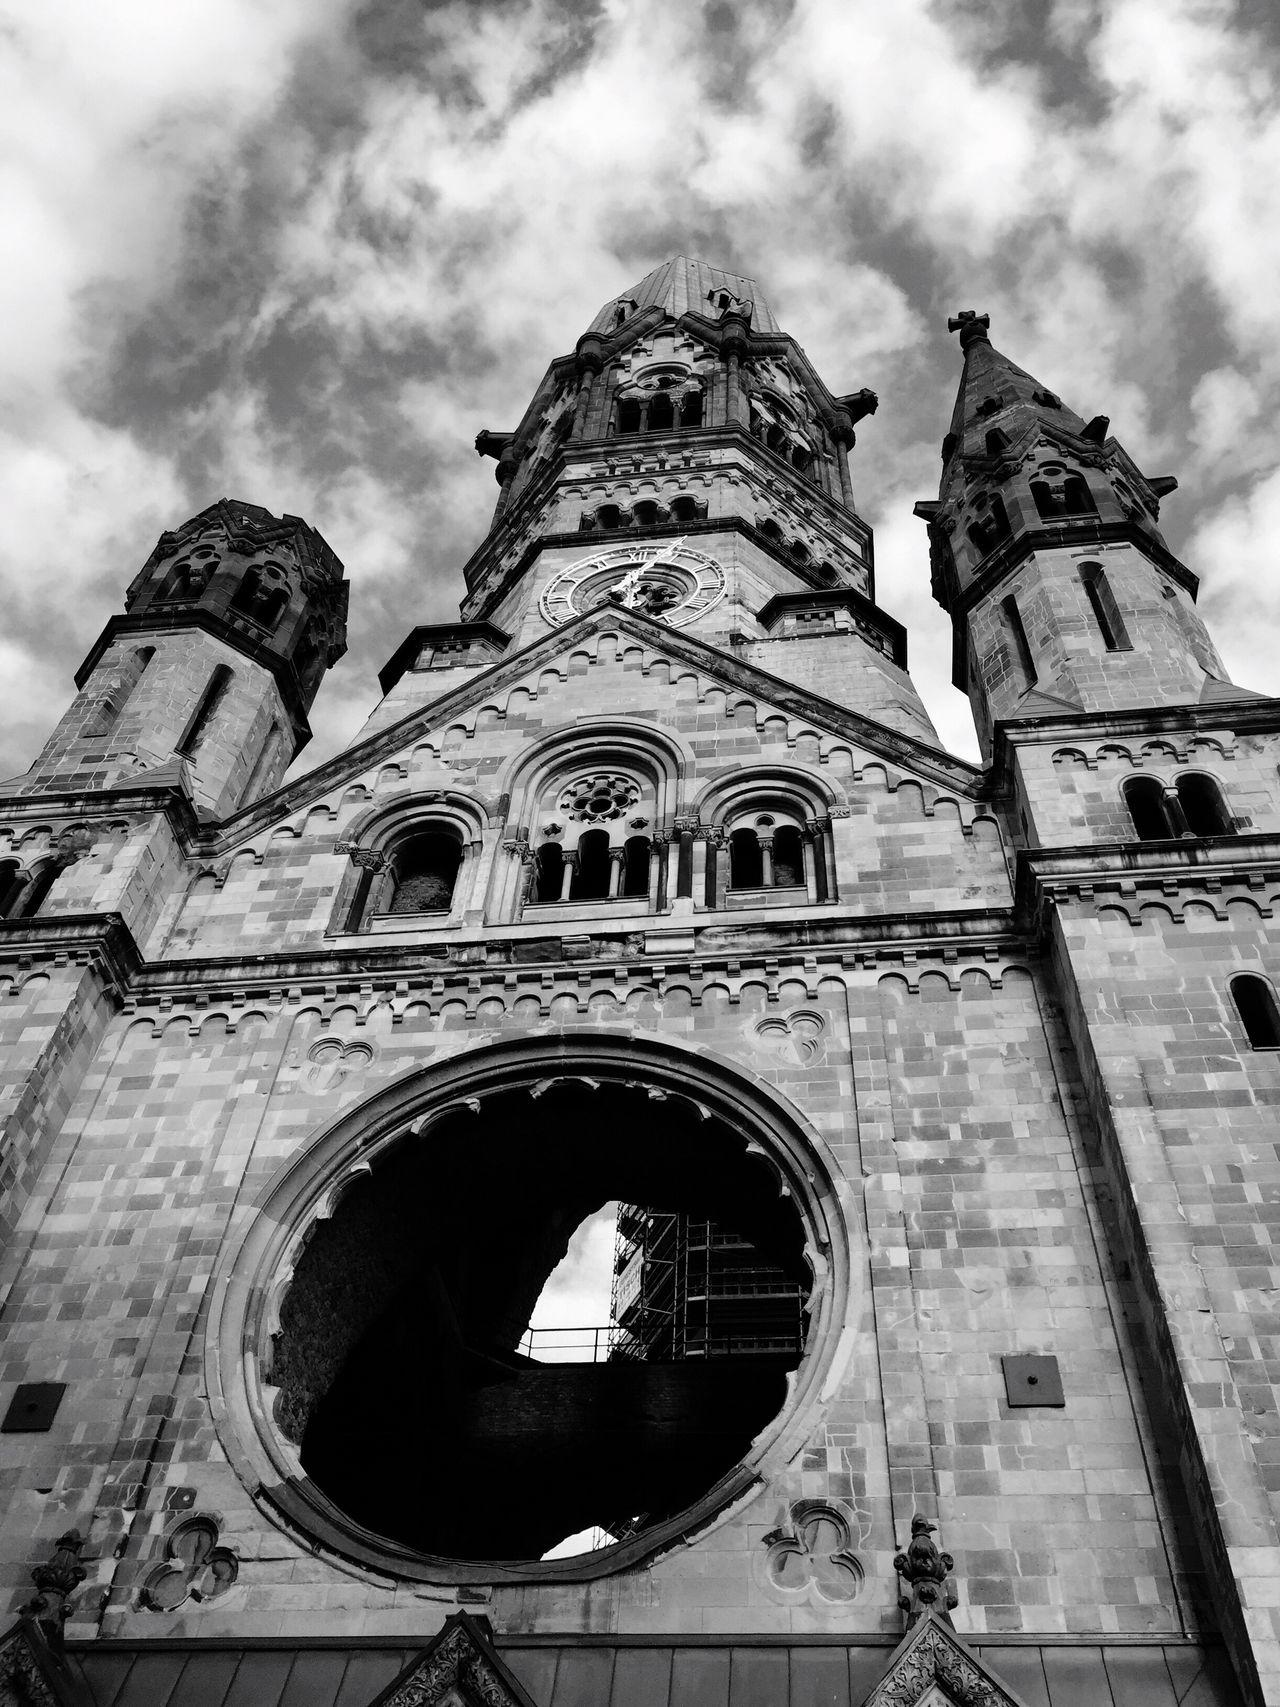 Kaiser Wilhelm Memorial Church, Berlin Hello World Berlin Kaiserwilhelmgedächtniskirche First Eyeem Photo Iphone6